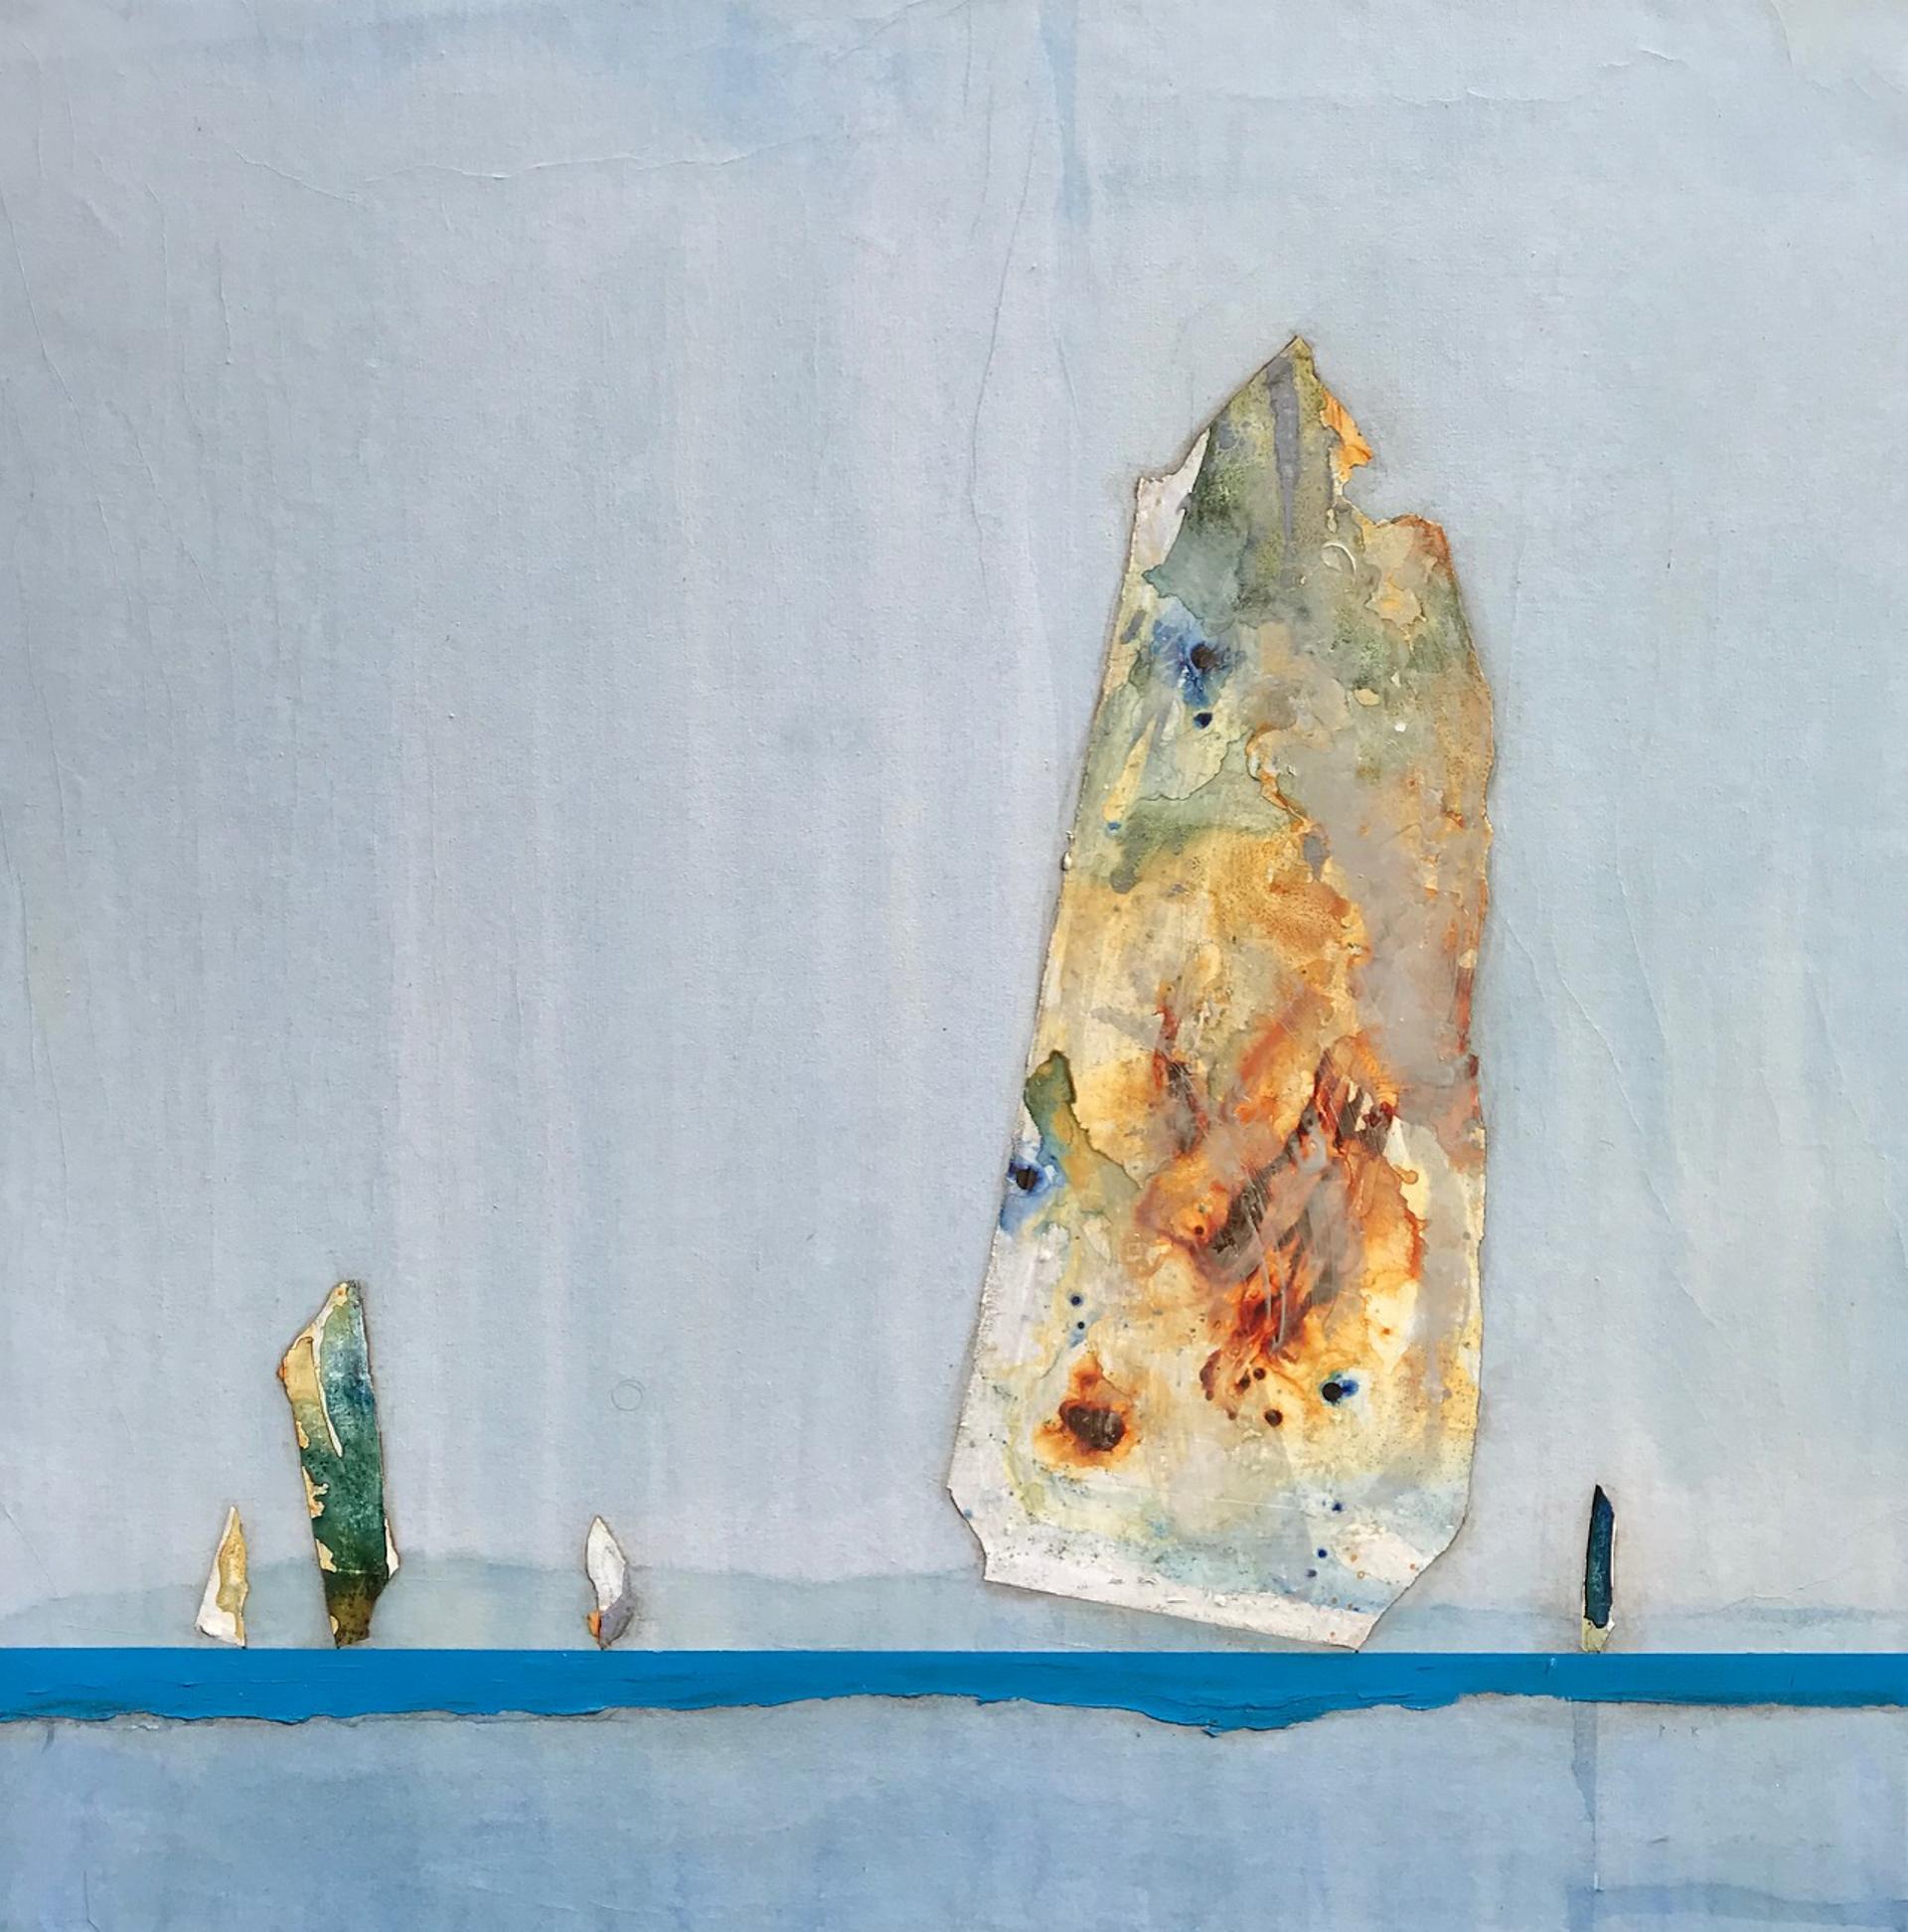 Saltwater by Peter Kuttner